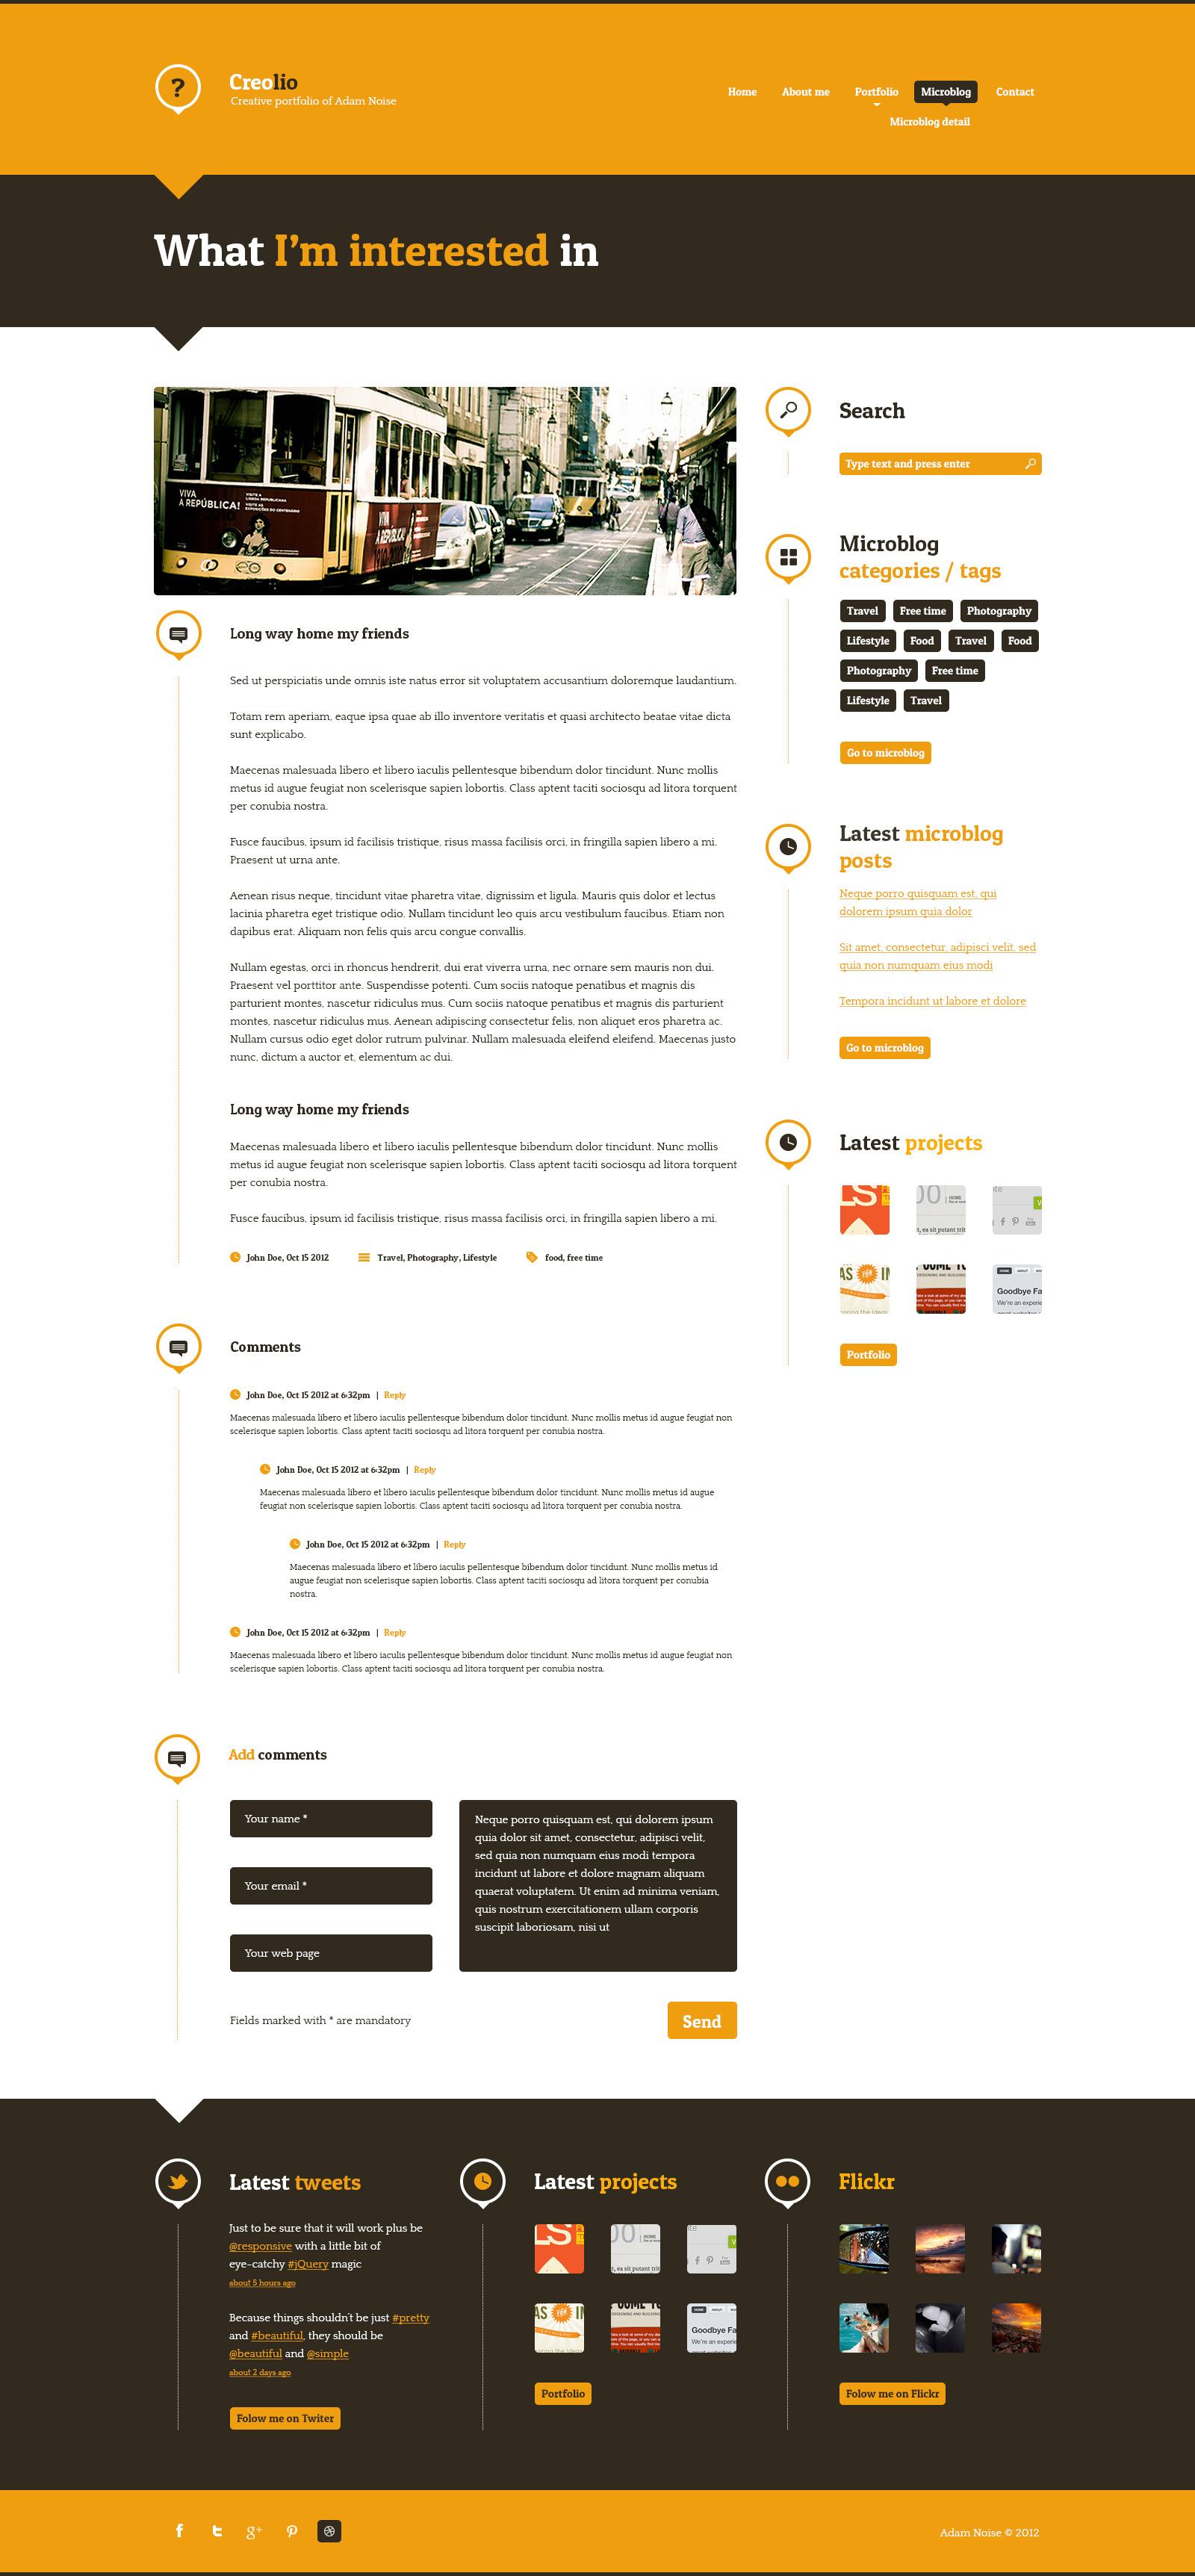 Creolio - Personal portfolio and microblog HTML